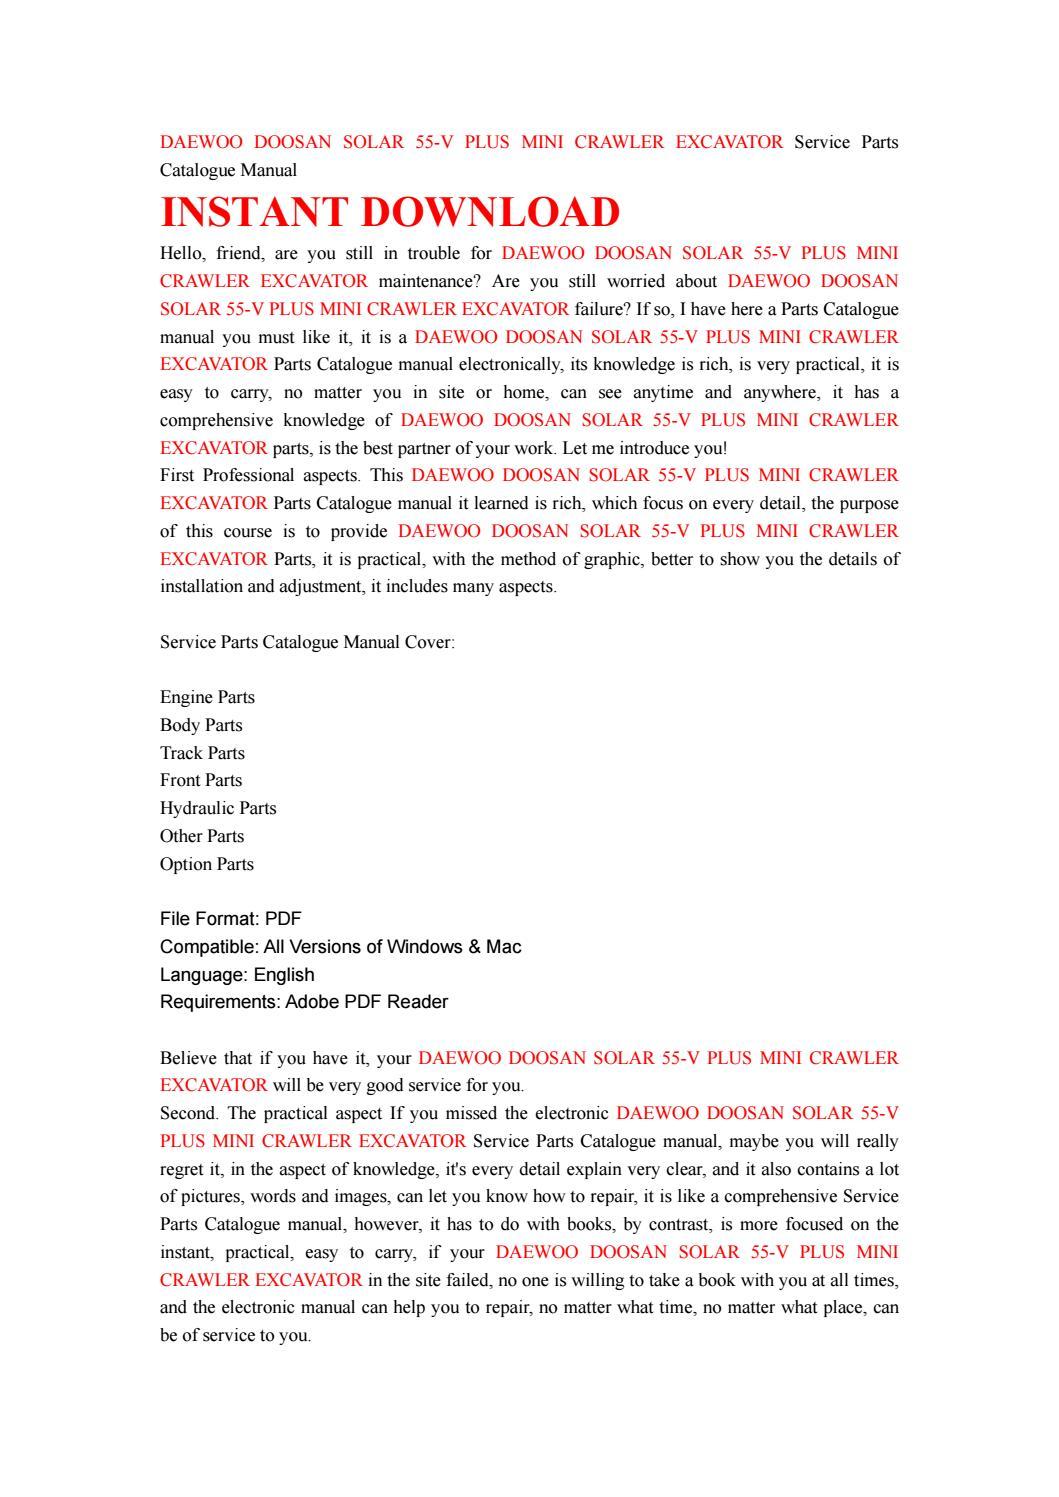 Daewoo doosan solar 55 v plus mini crawler excavator service parts  catalogue manual by ksfsen7duf - issuu